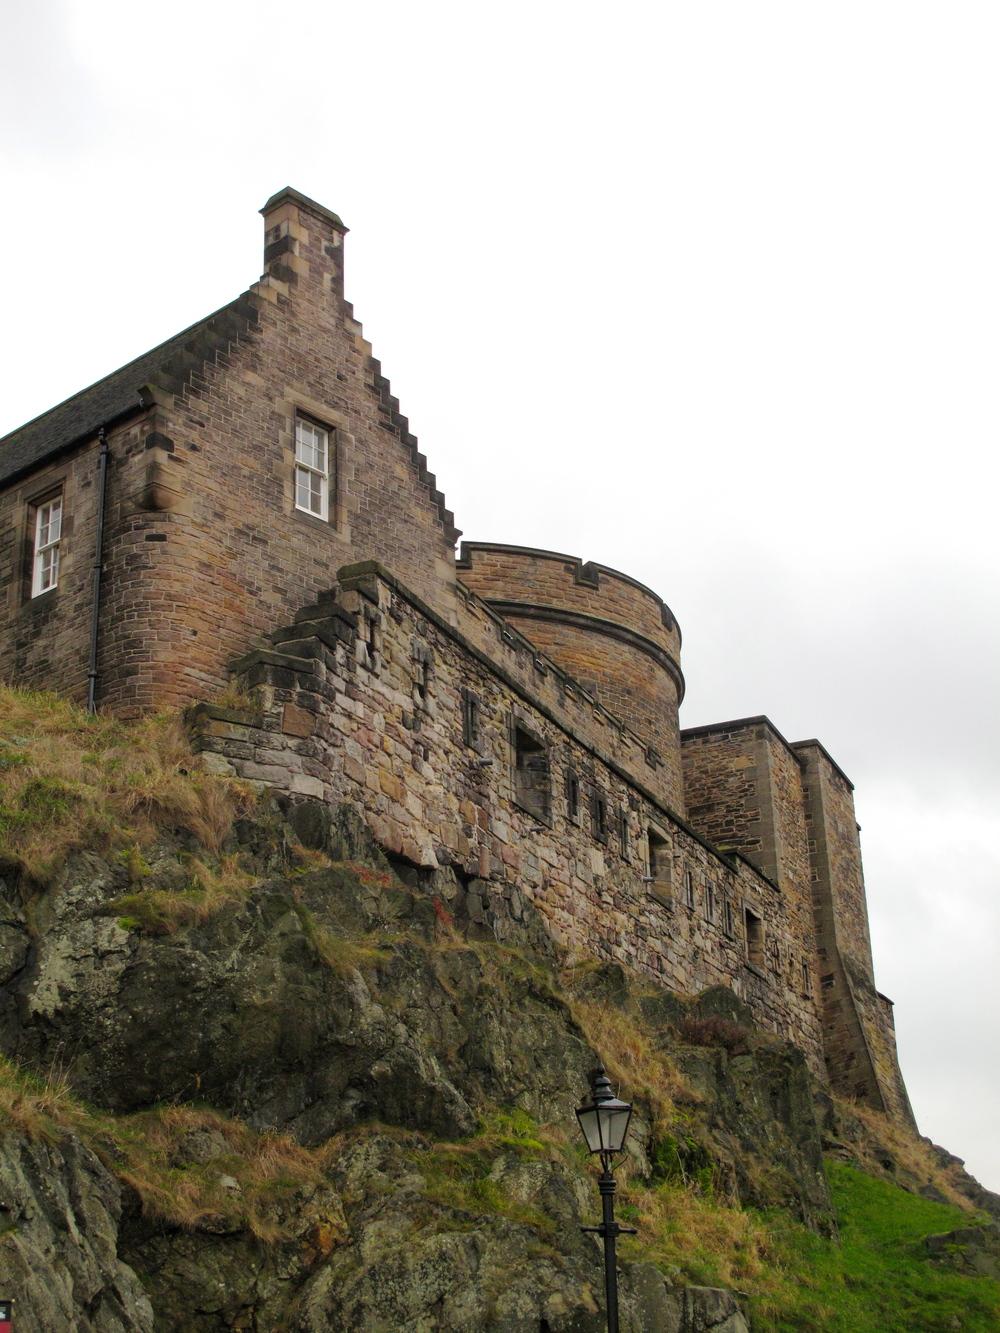 Stone buildings inside the walls of Edinburgh Castle.